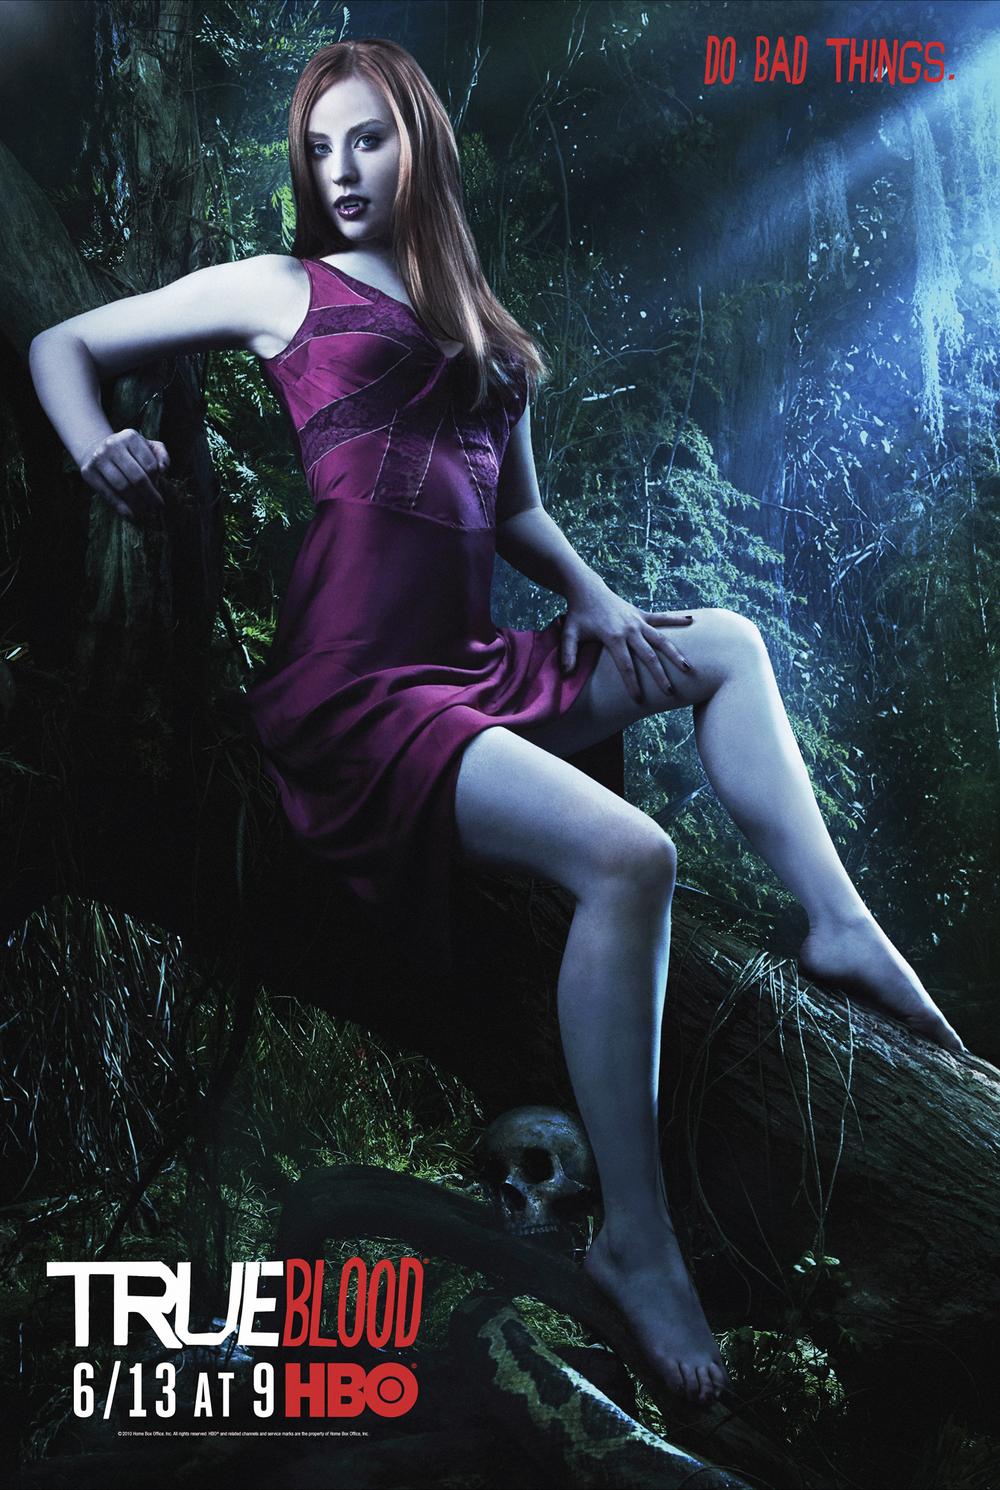 Deborah Ann Woll for HBO's True Blood - Los Angeles, CA